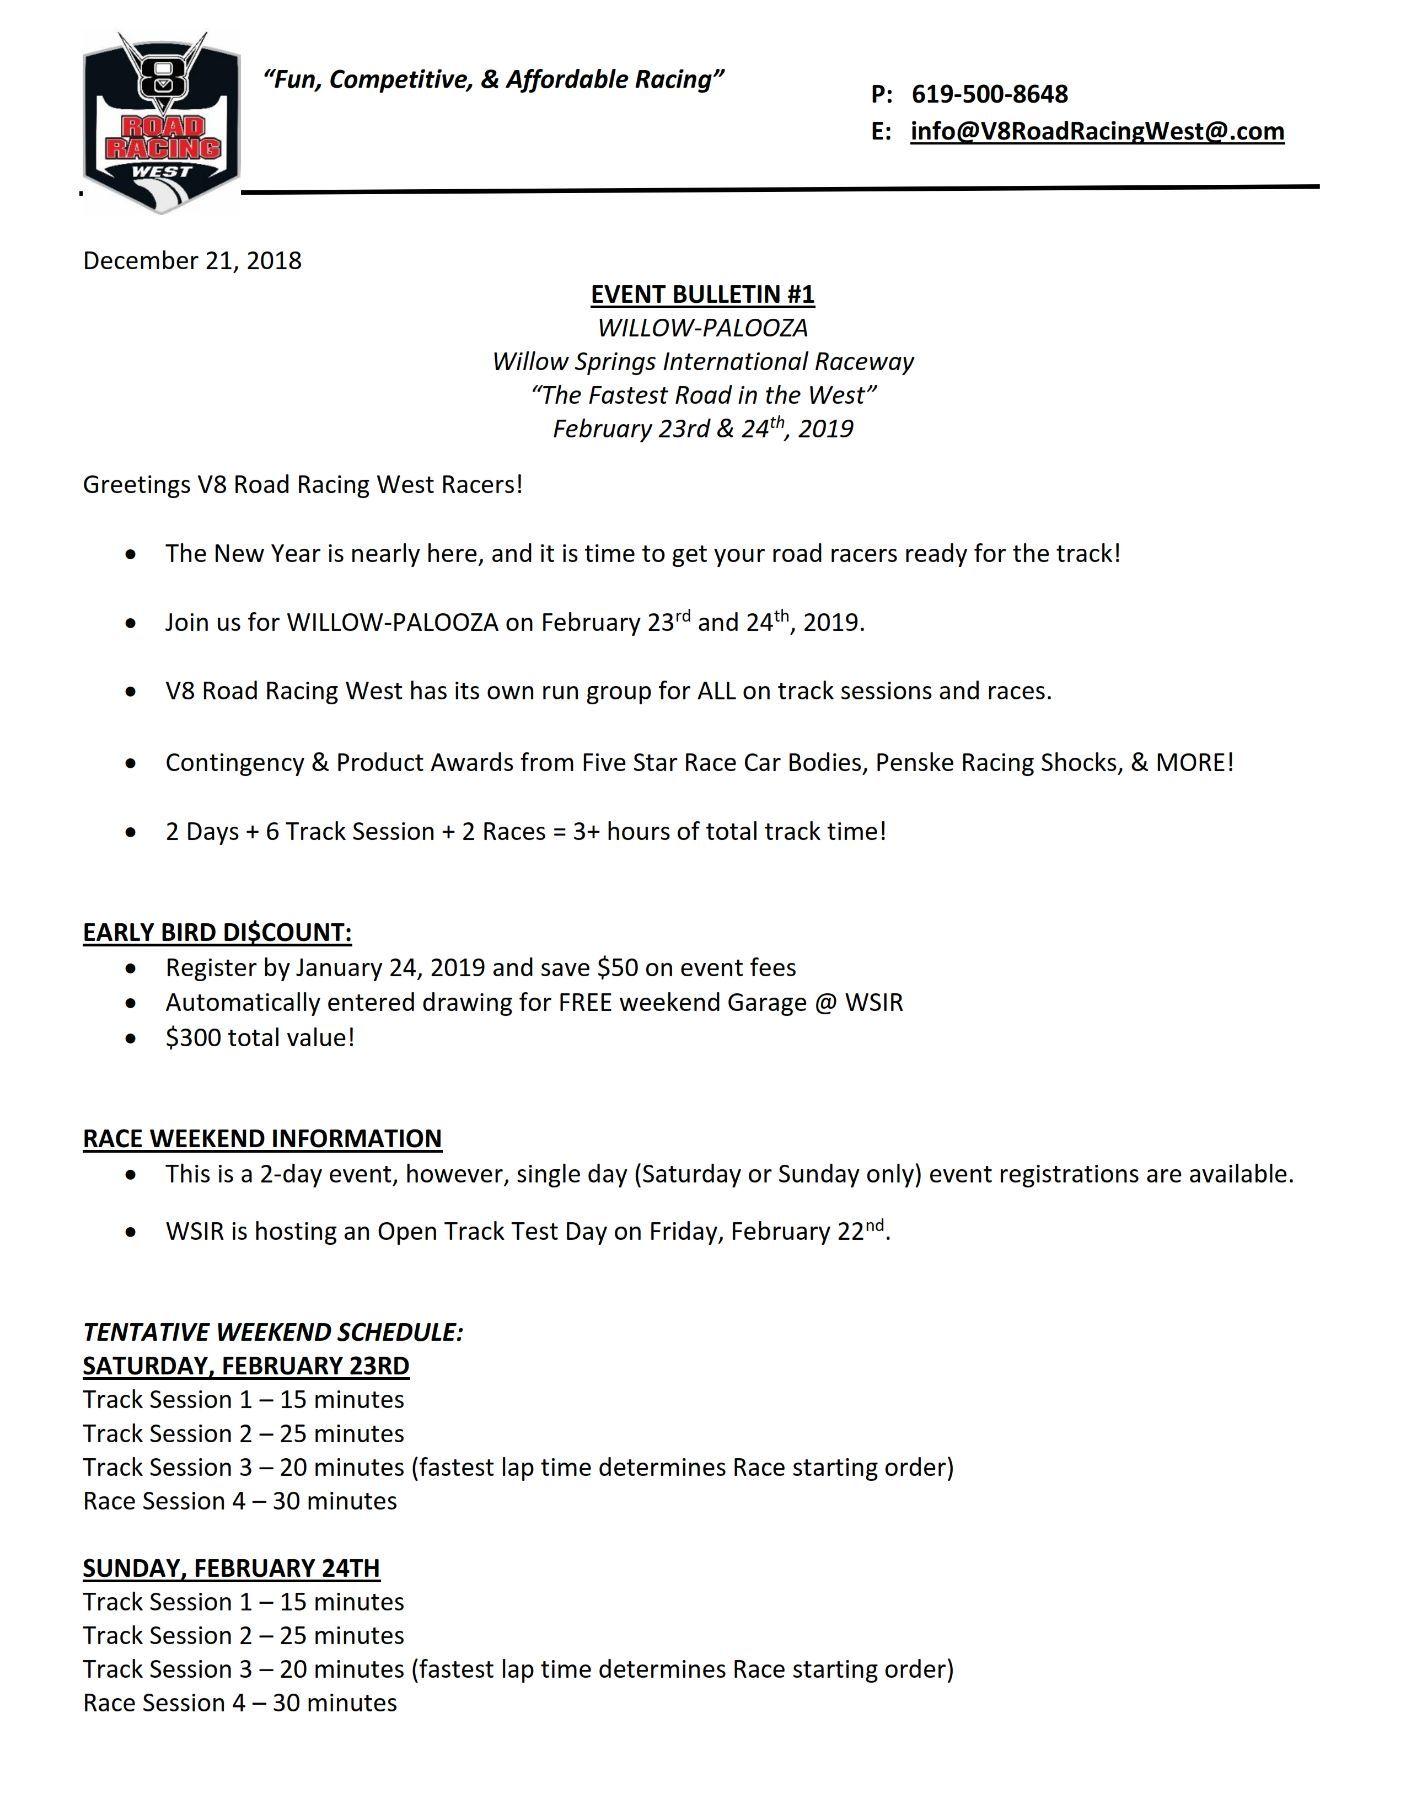 WILLOW-PALOOZA V8 ROAD RACING WEST - V8RRW info on Feb 23